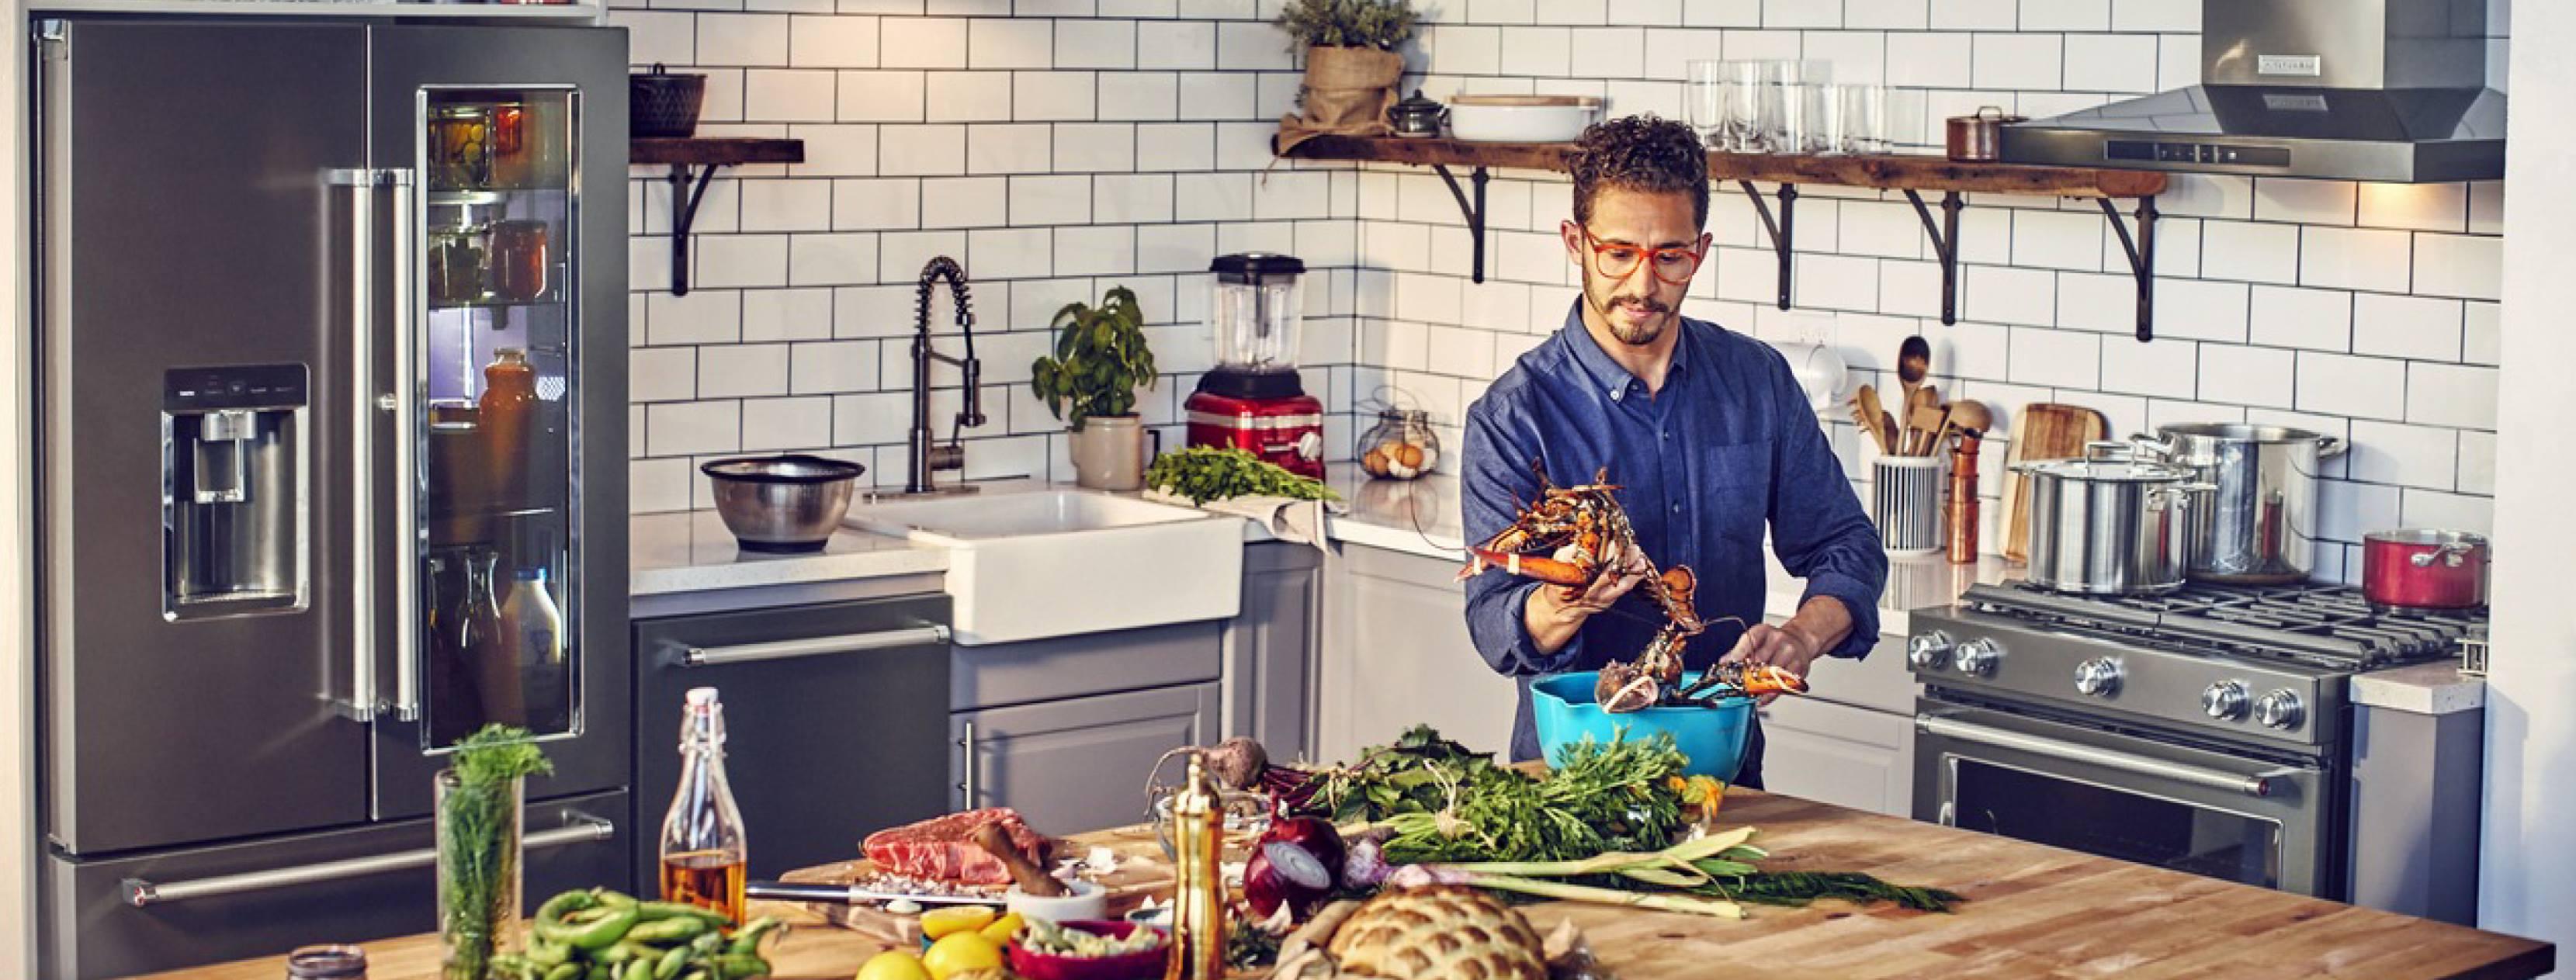 KitchenAid Kitchen Appliances Can Change Your Life